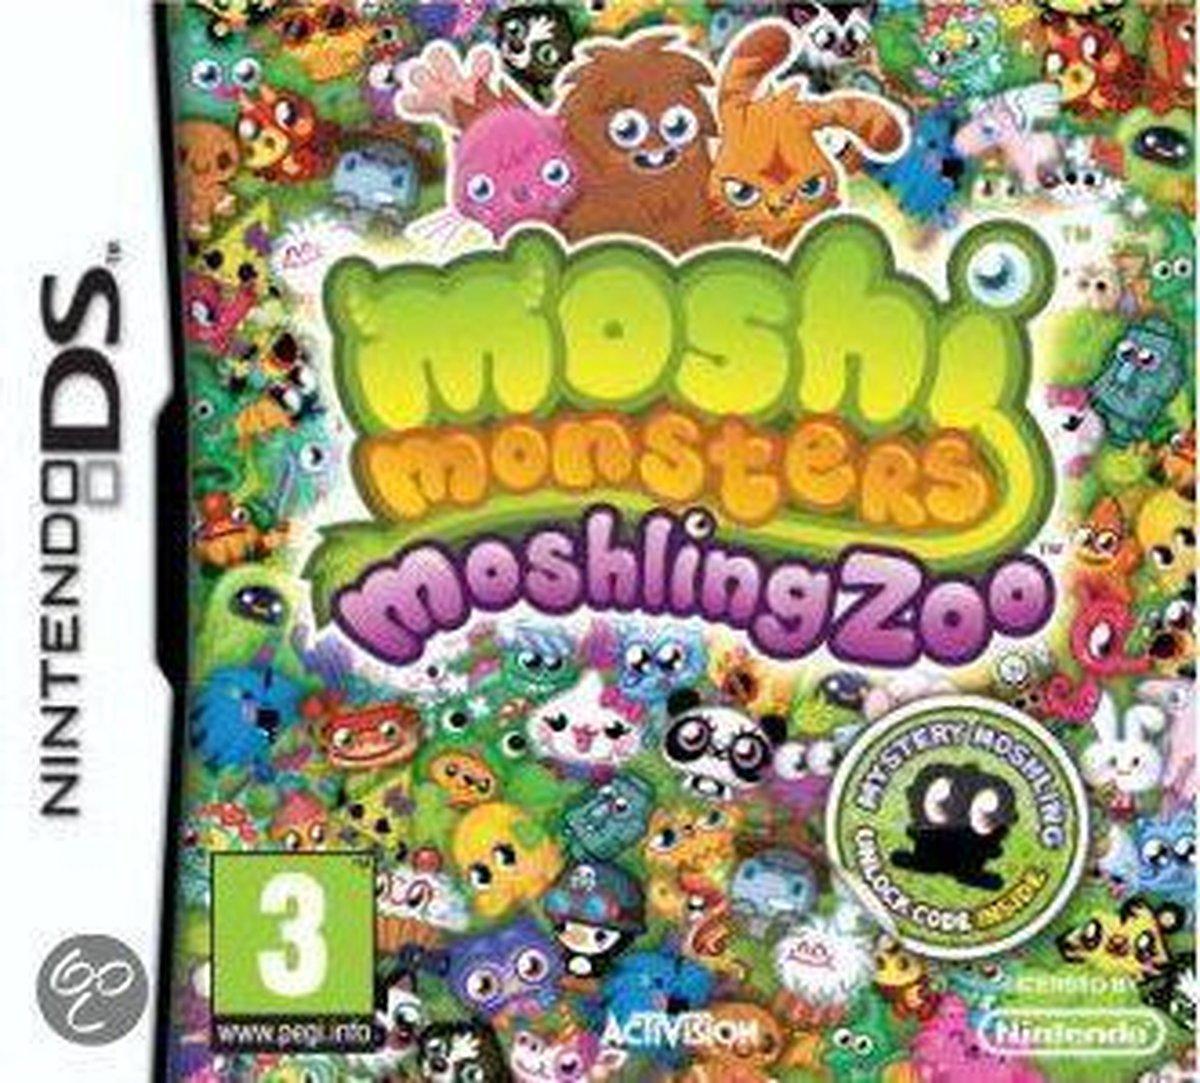 Activision Moshi Monsters: Moshling Zoo - Activision